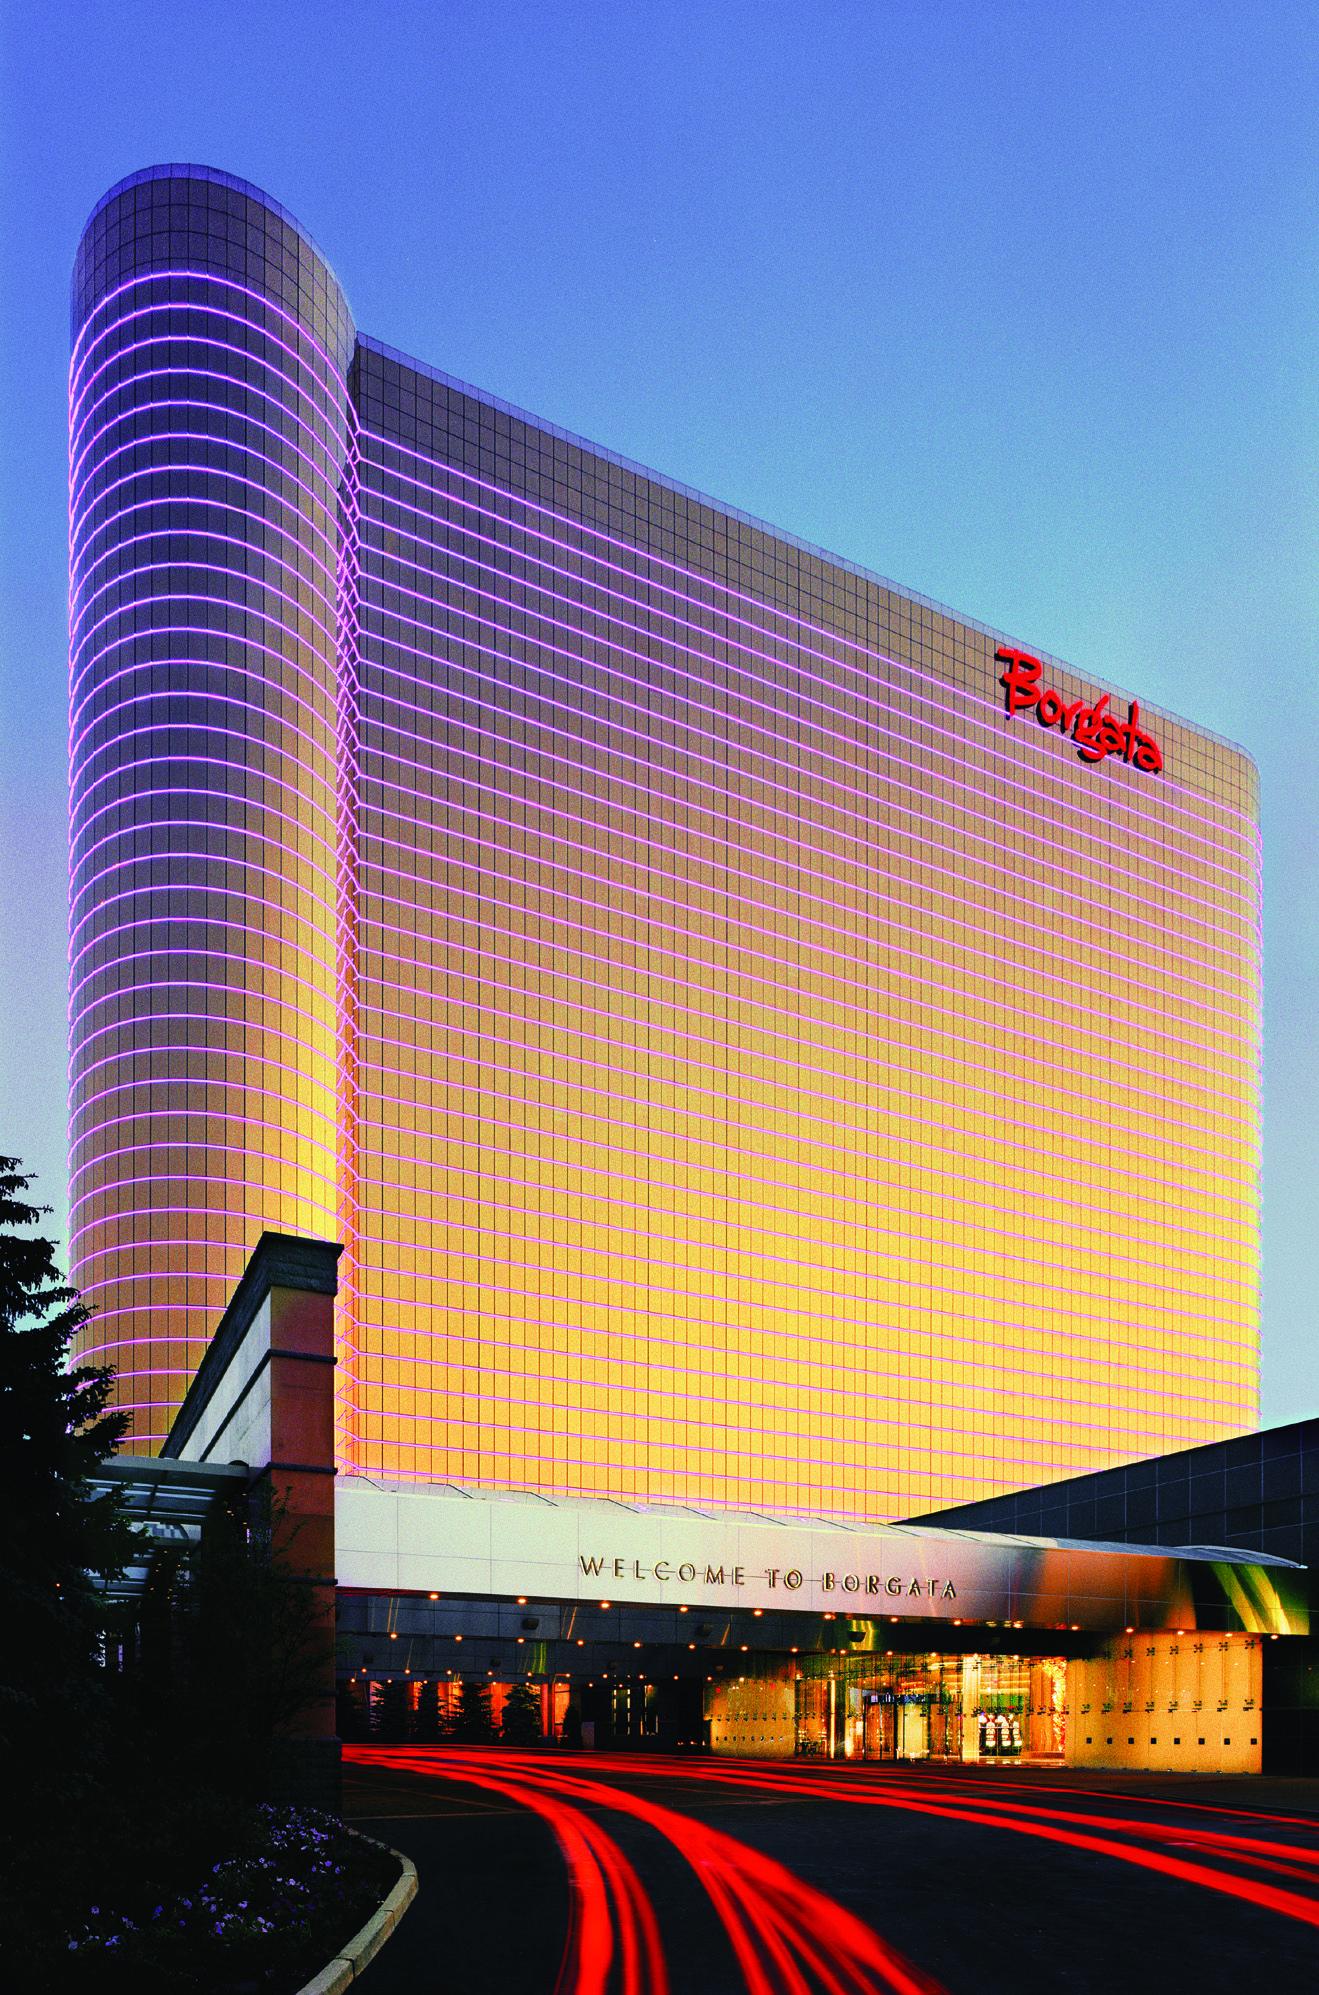 Borgata Hotel Casino Spa Atlantic City Nj Atlantic City Hotels Weekend Getaways From Nyc Atlantic City